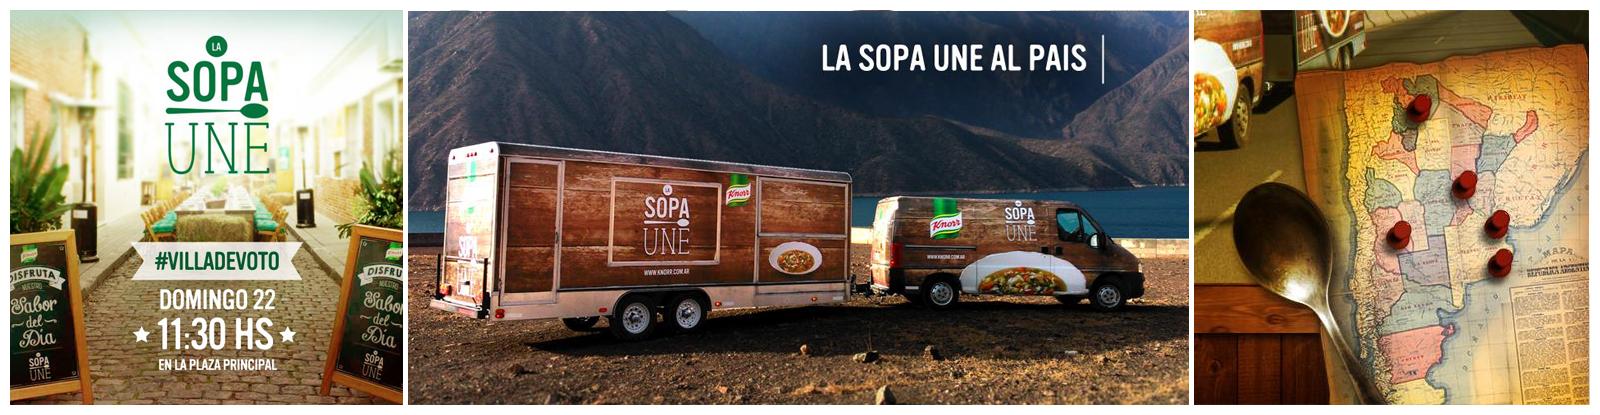 La Sopa une